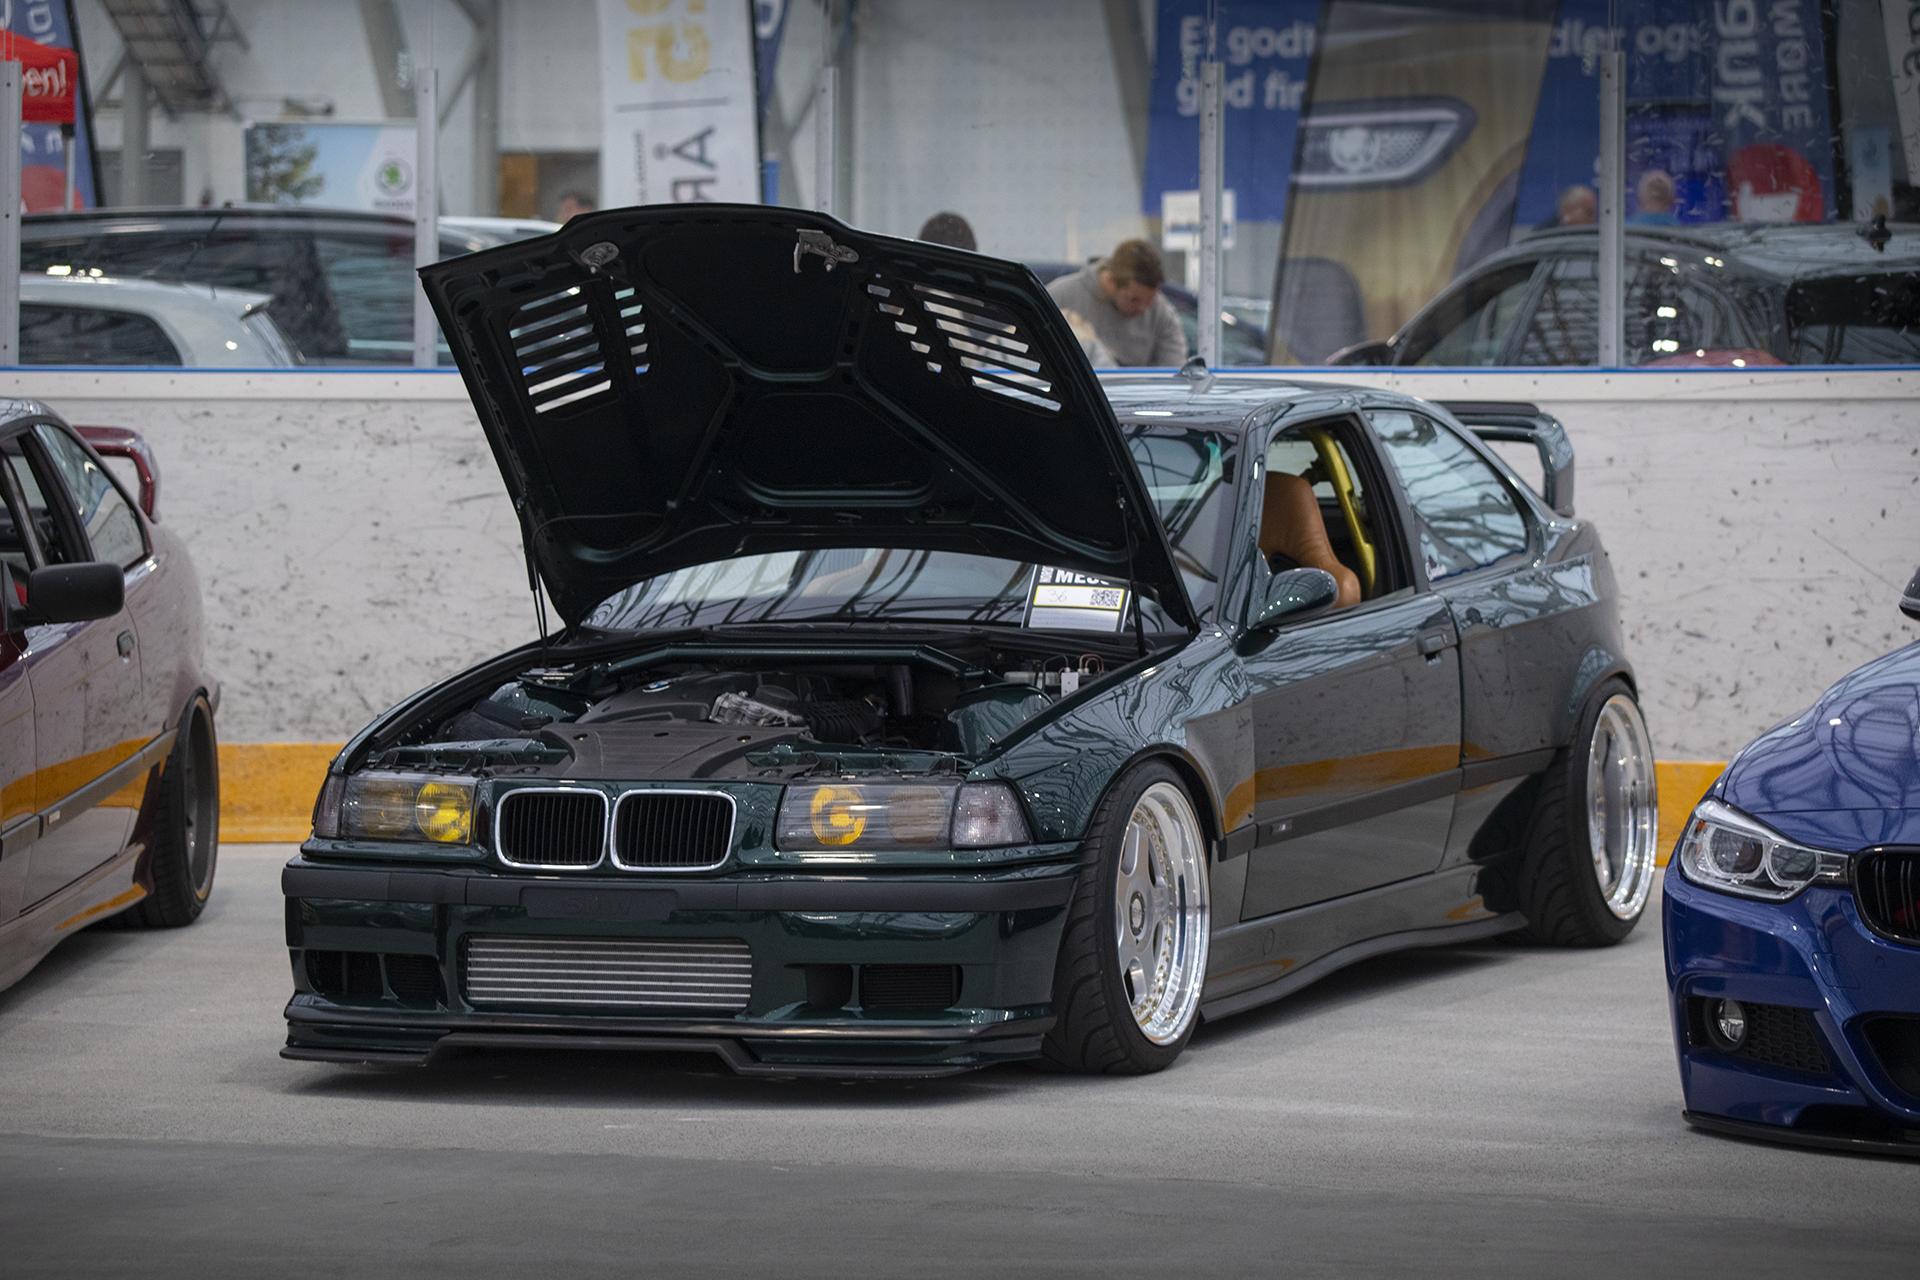 Halfdan Vatn tok hjem andreplass på messen for sin BMW E36 Compact.